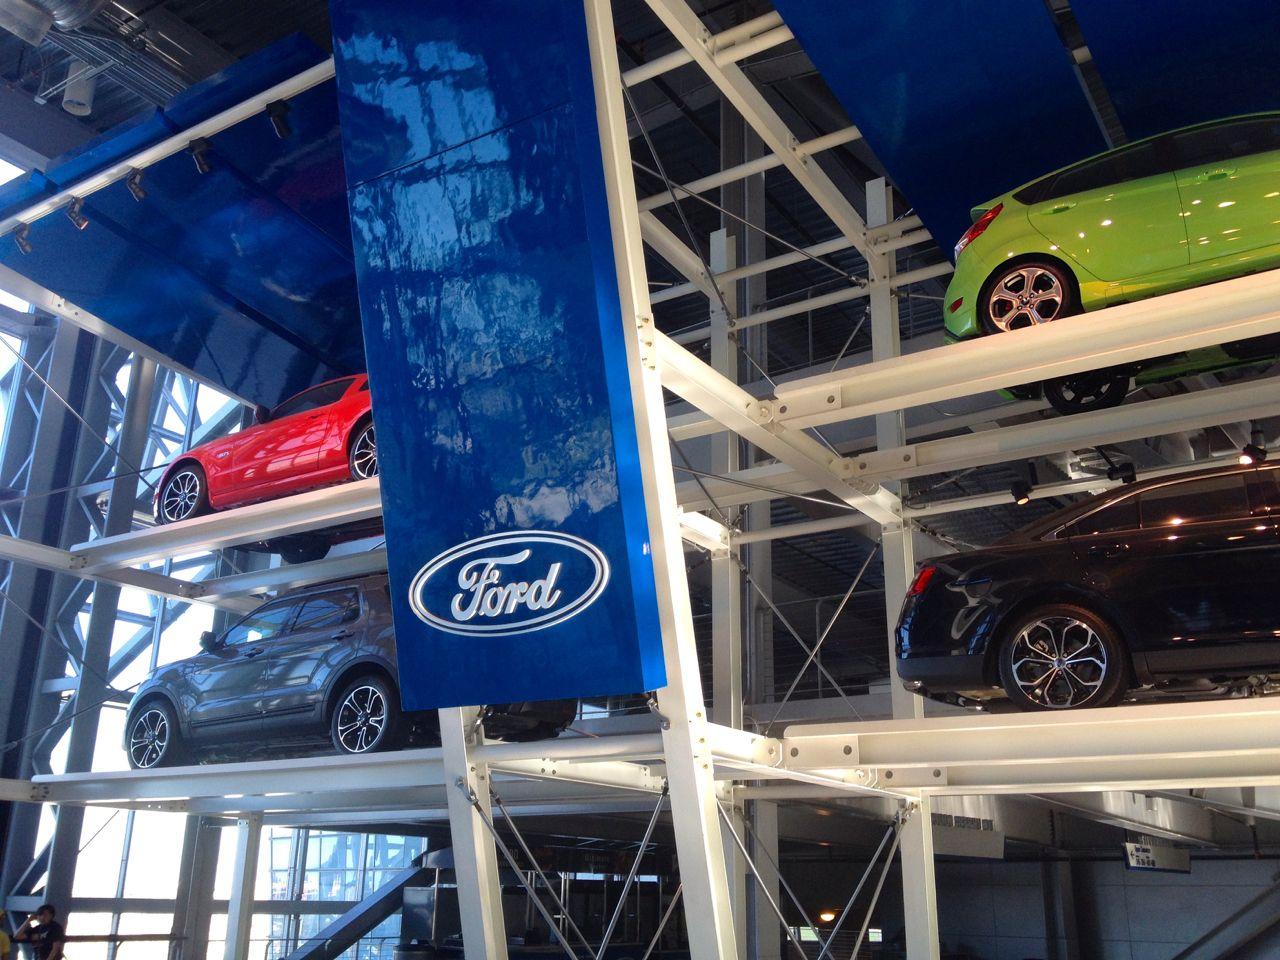 Ford Dealership Arlington Tx >> The Ford Museum At At T Stadium In Arlington Tx Museum